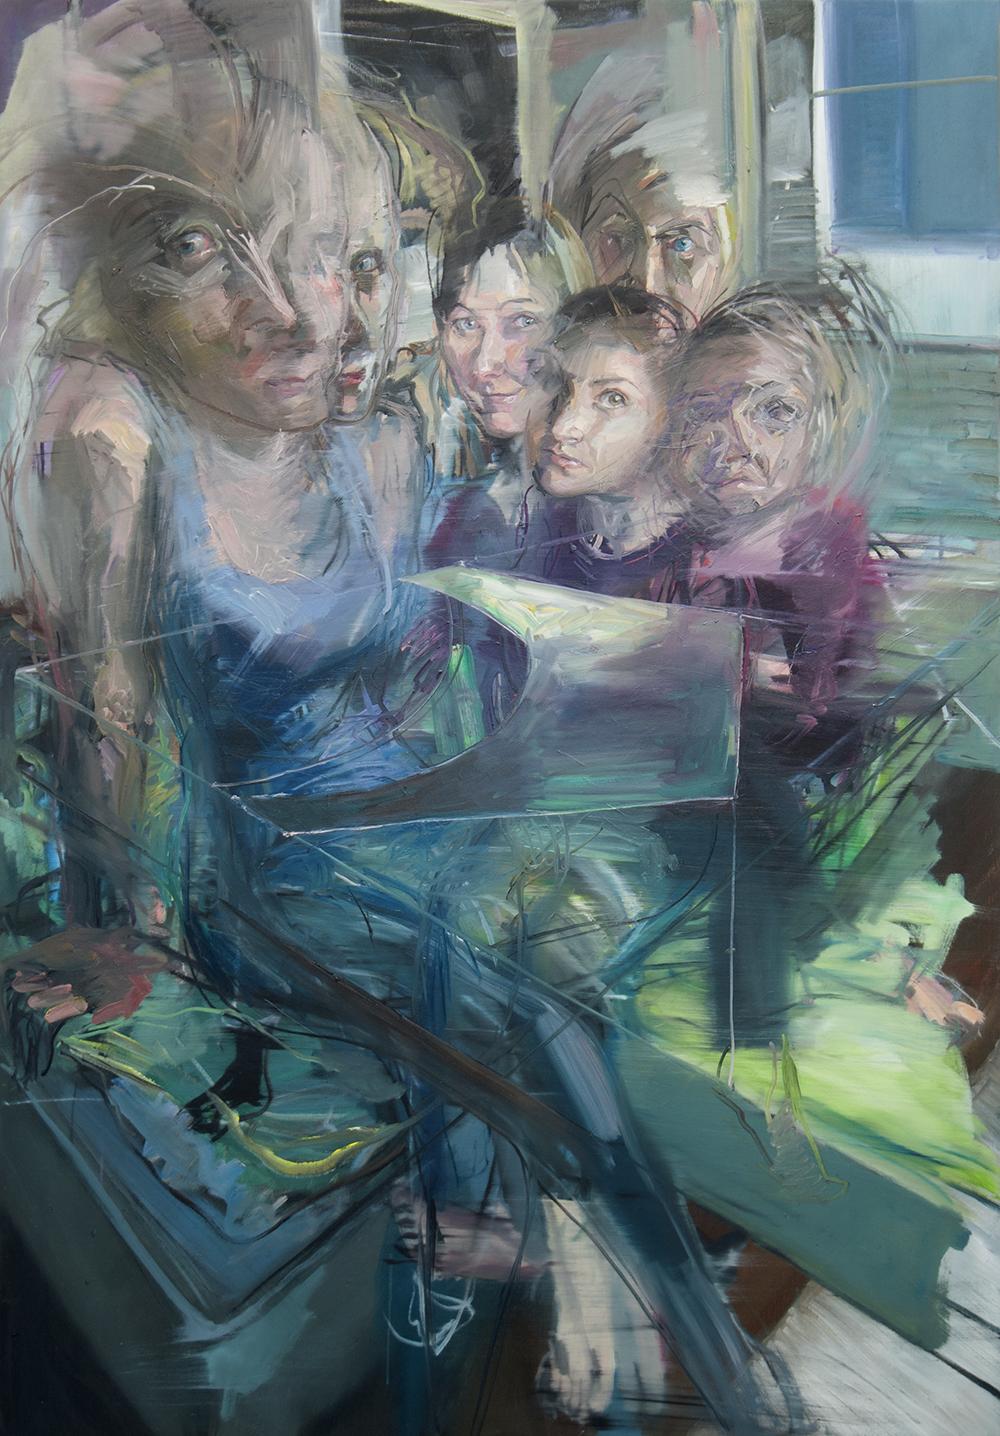 Mush 2017 100 x 142cm Oil on canvas